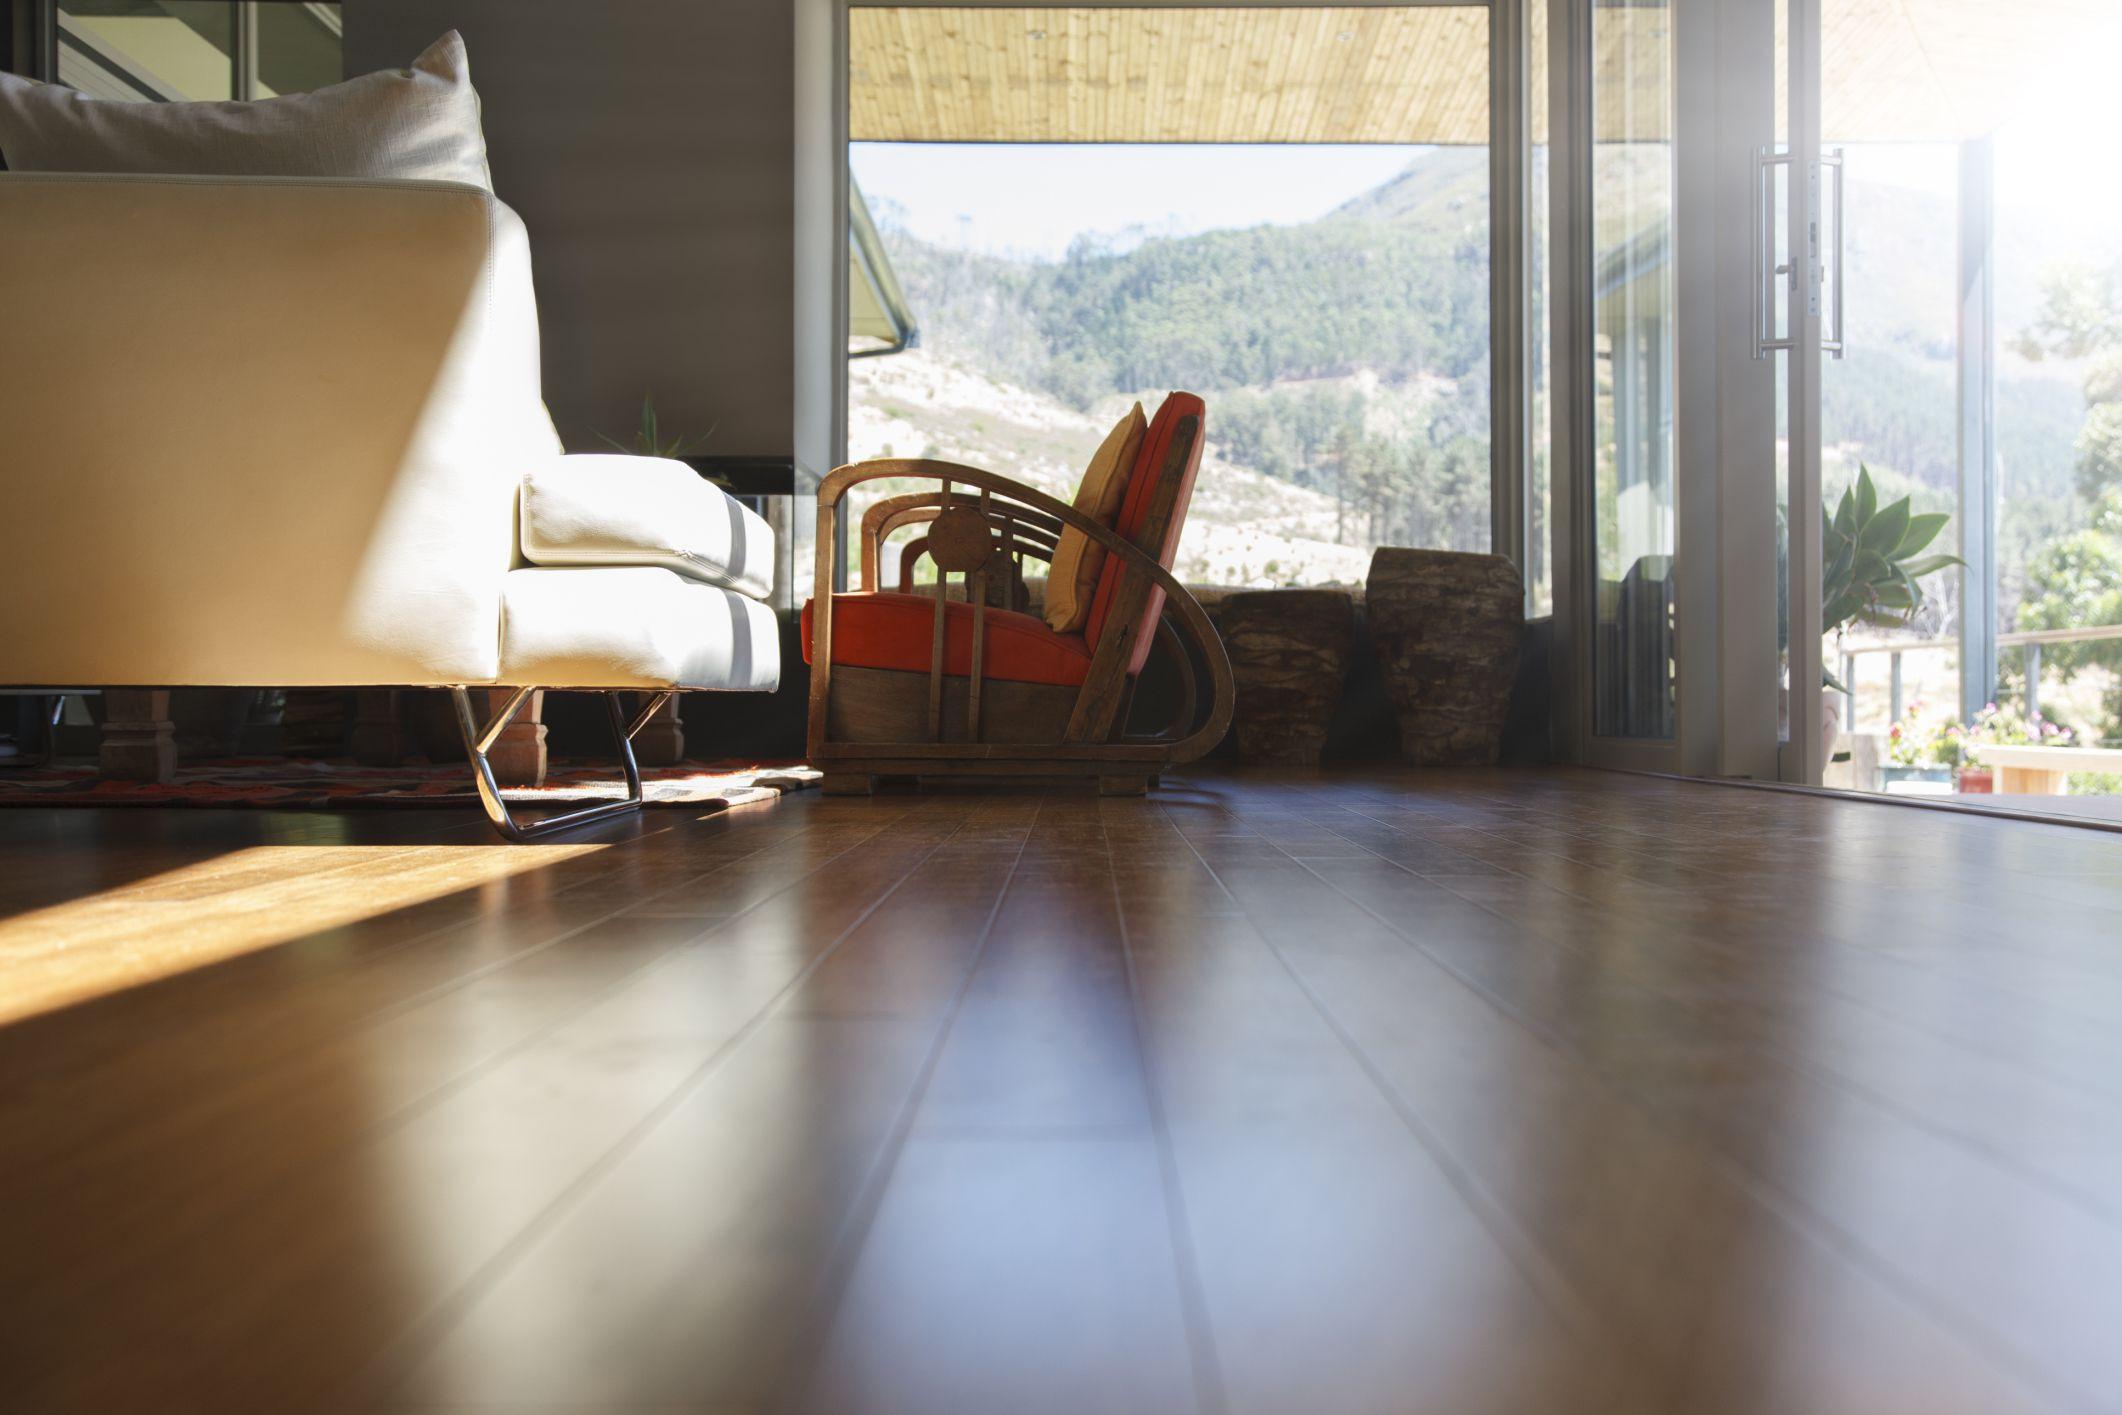 best hardwood floors for pets of 5 best luxury vinyl plank floors within exotic hardwood flooring 525439899 56a49d3a3df78cf77283453d